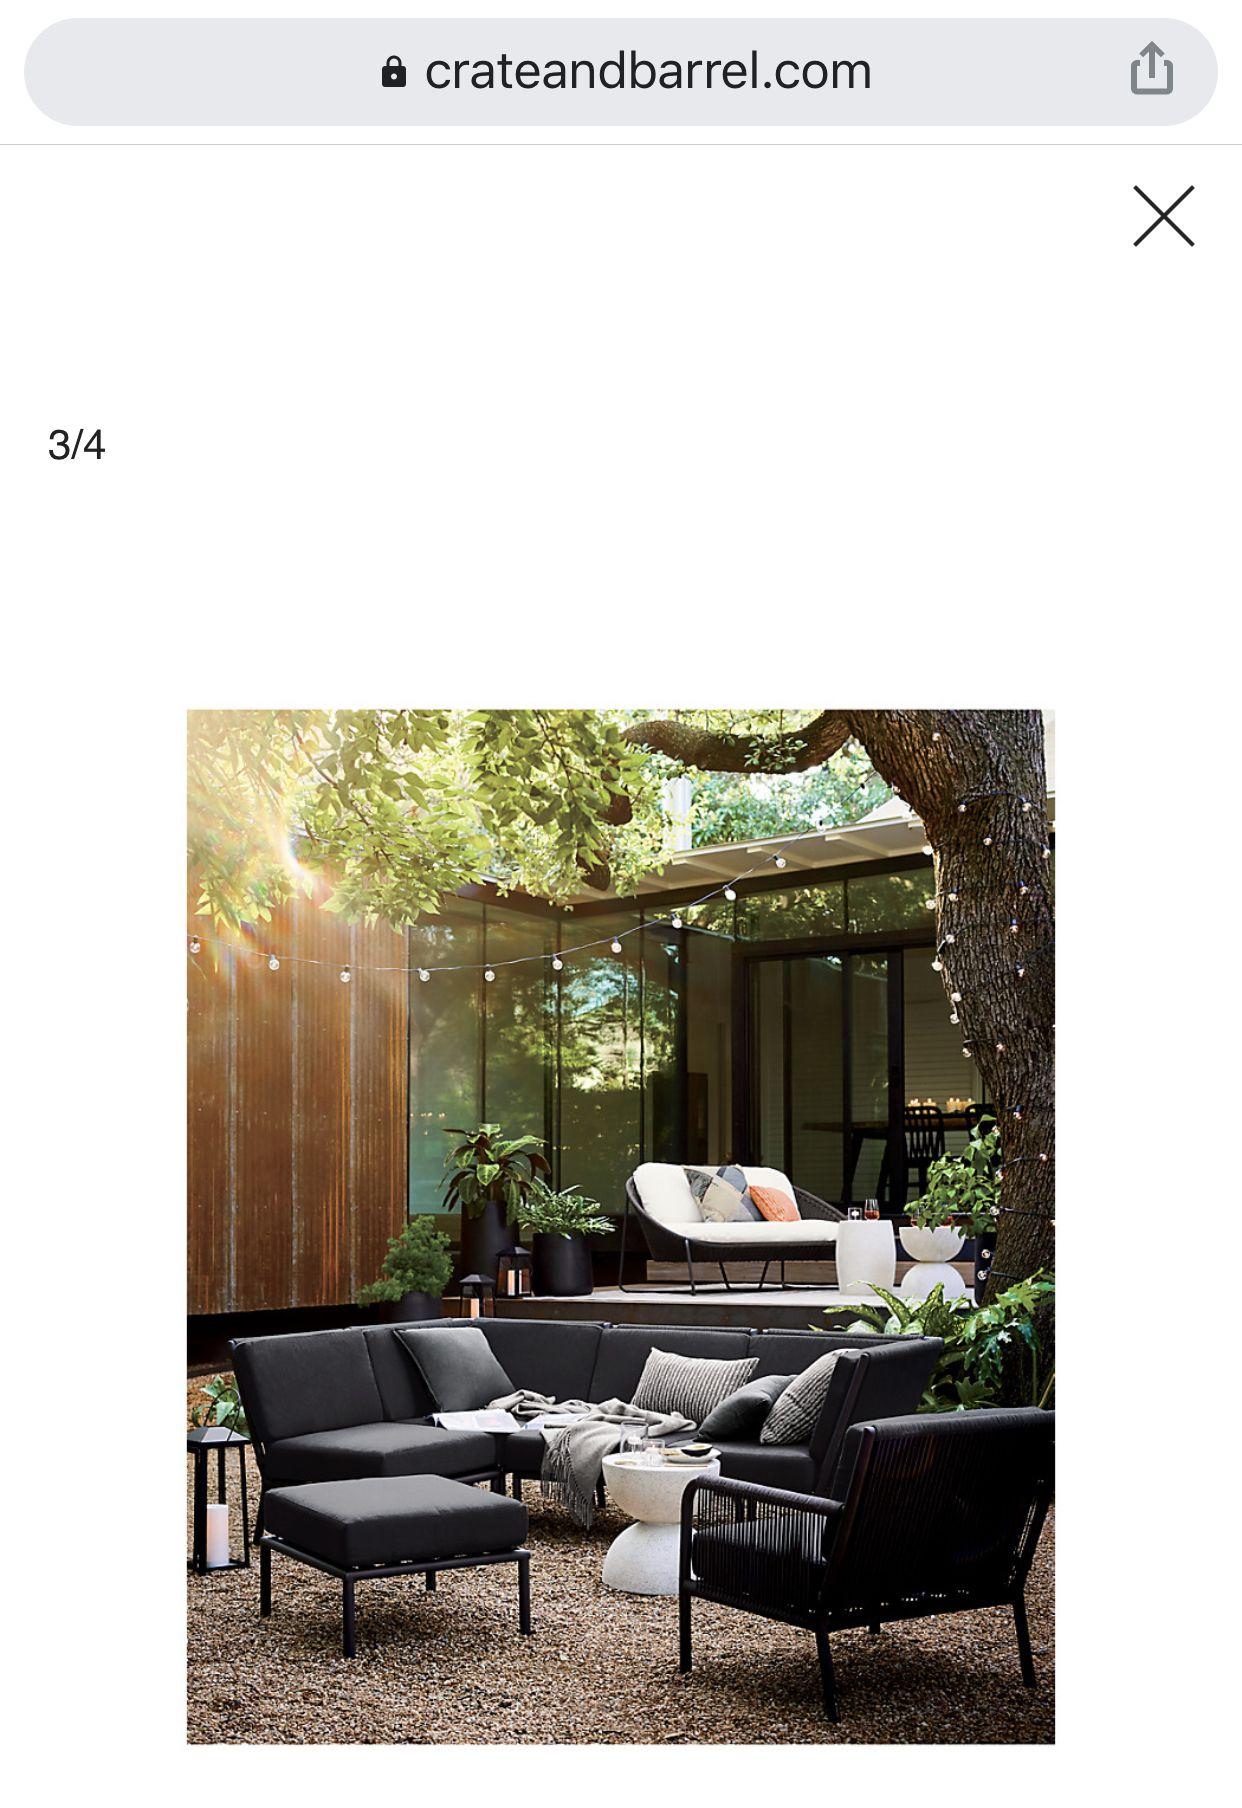 Belham Living Merced Daybed Discount Bedroom Furniture Daybed Room Best Leather Sofa